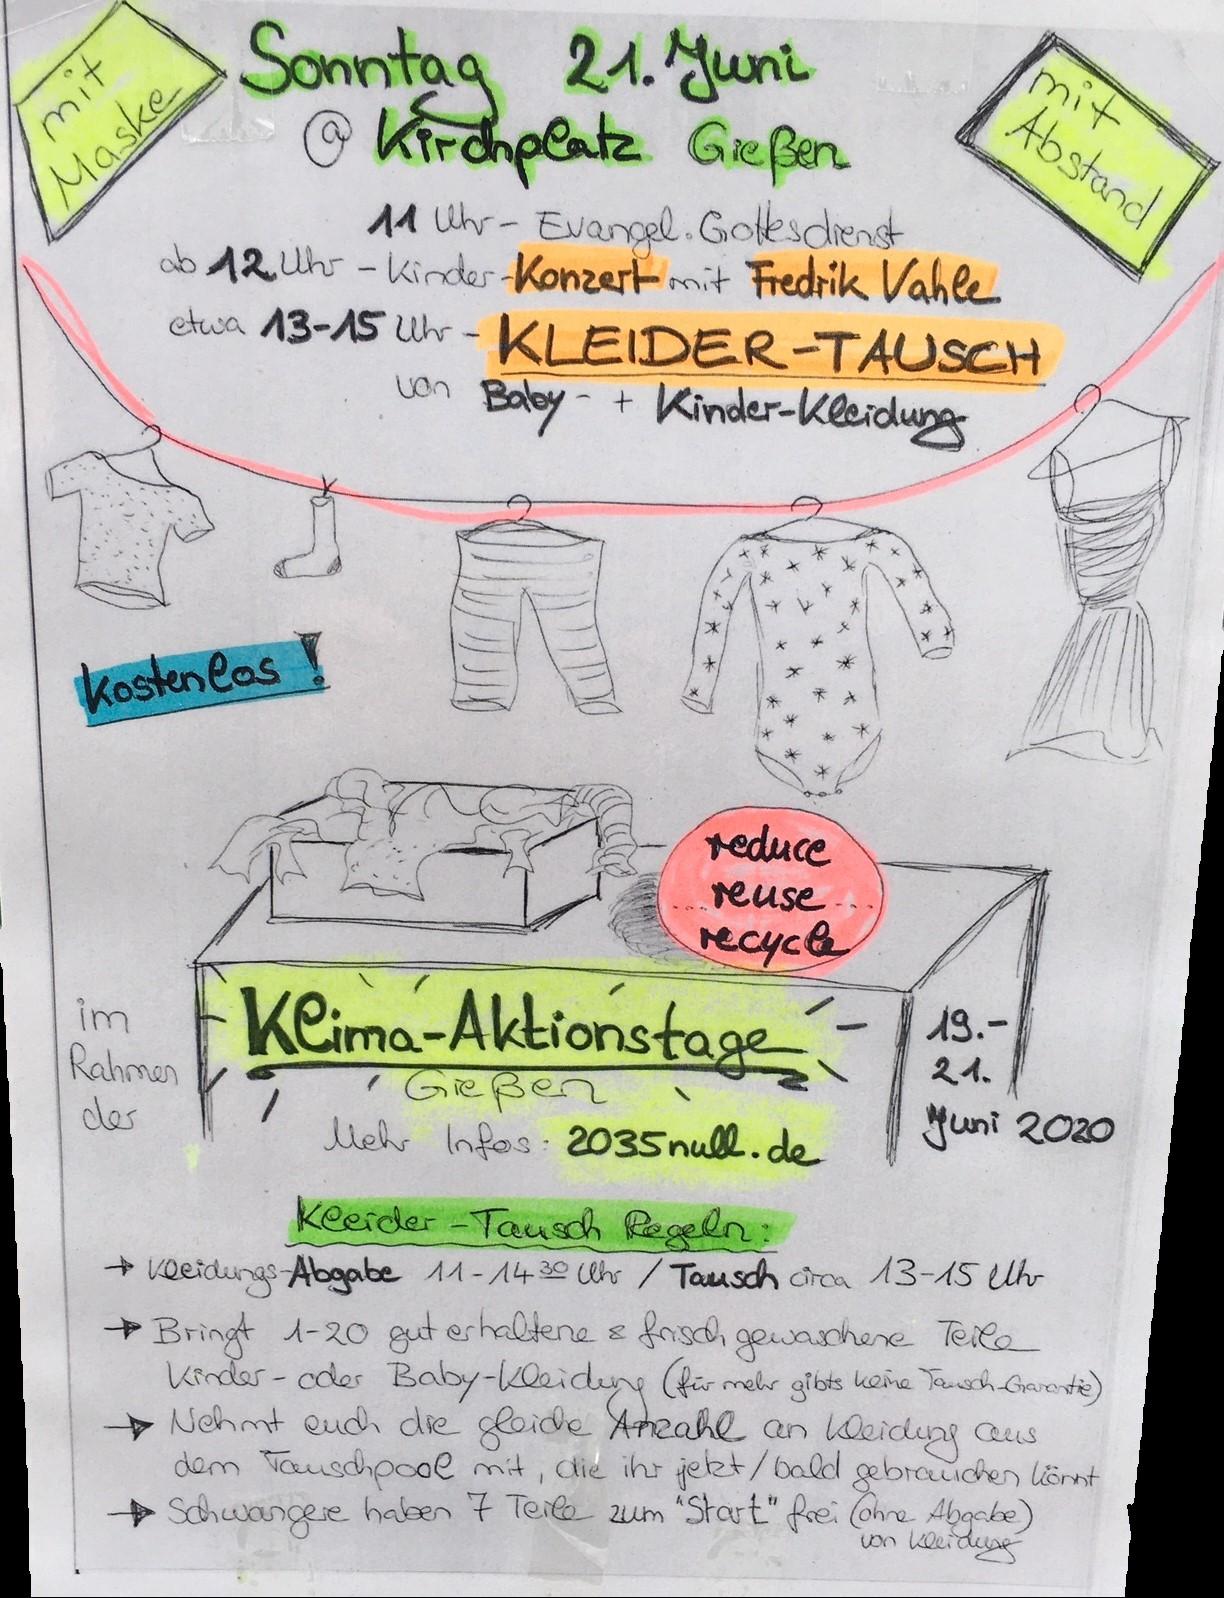 Kinderkleider-Tauschbörse Plakat Parents 4 Future